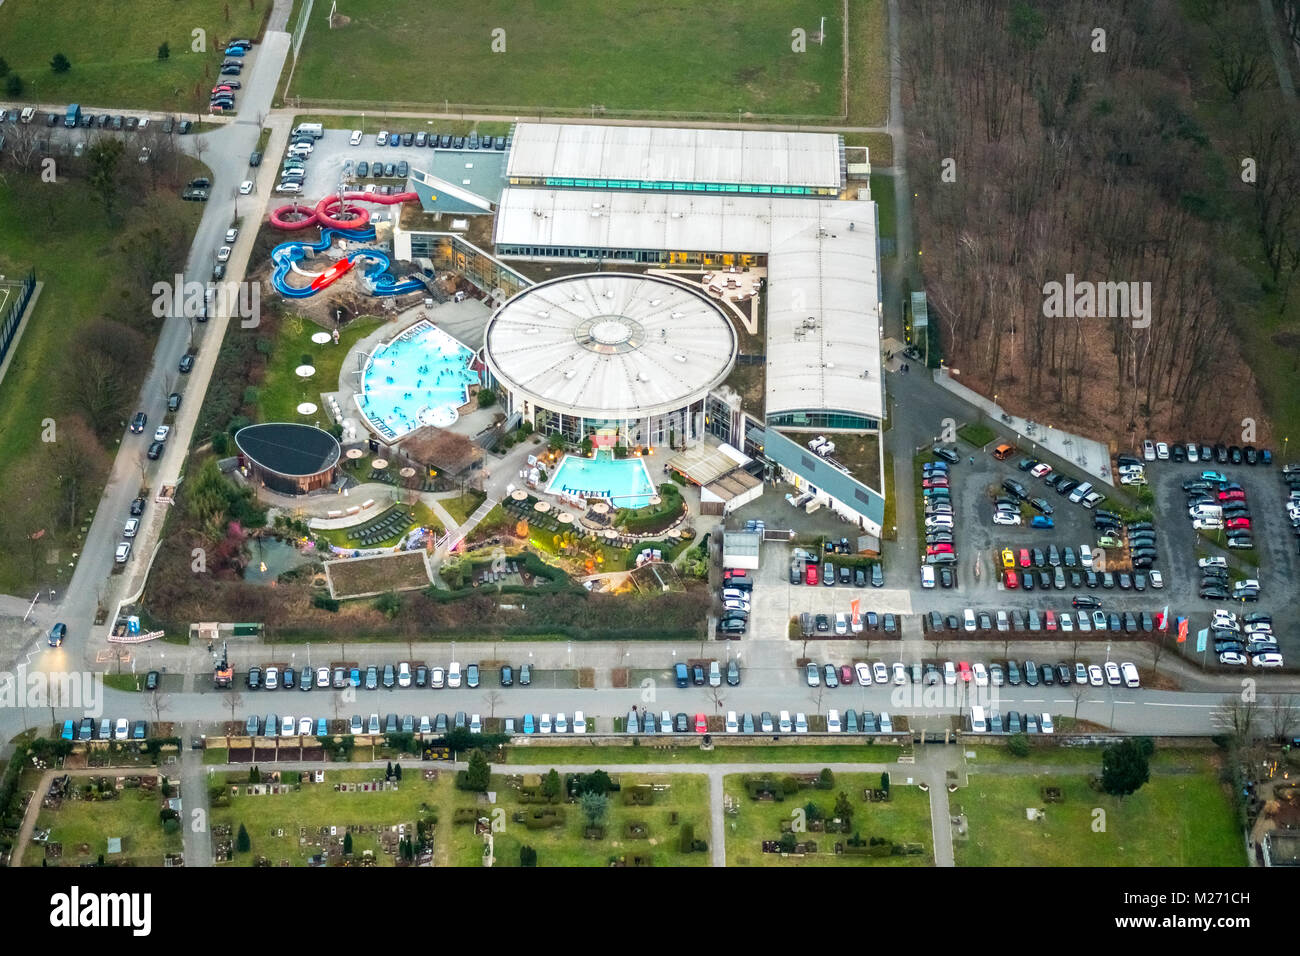 Maximare, experience therme Bad Hamm, sauna and outdoor pool, indoor pool, Hamm, Ruhr, Nordrhein-Westfalen, Germany, - Stock Image